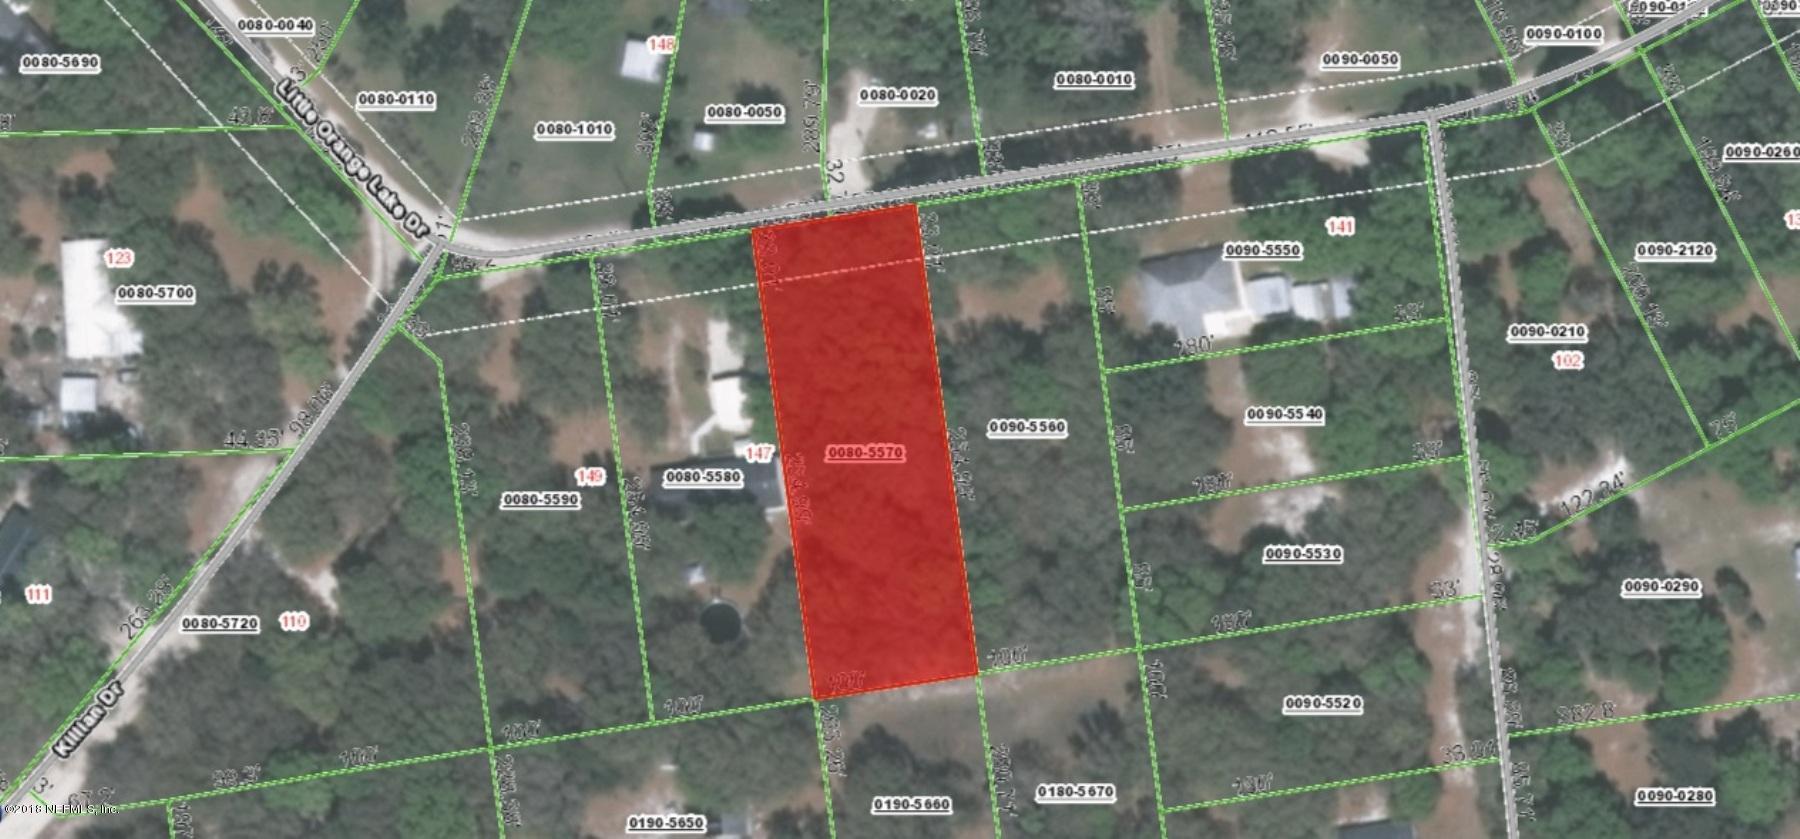 000 LITTLE ORANGE LAKE, HAWTHORNE, FLORIDA 32640, ,Vacant land,For sale,LITTLE ORANGE LAKE,936536